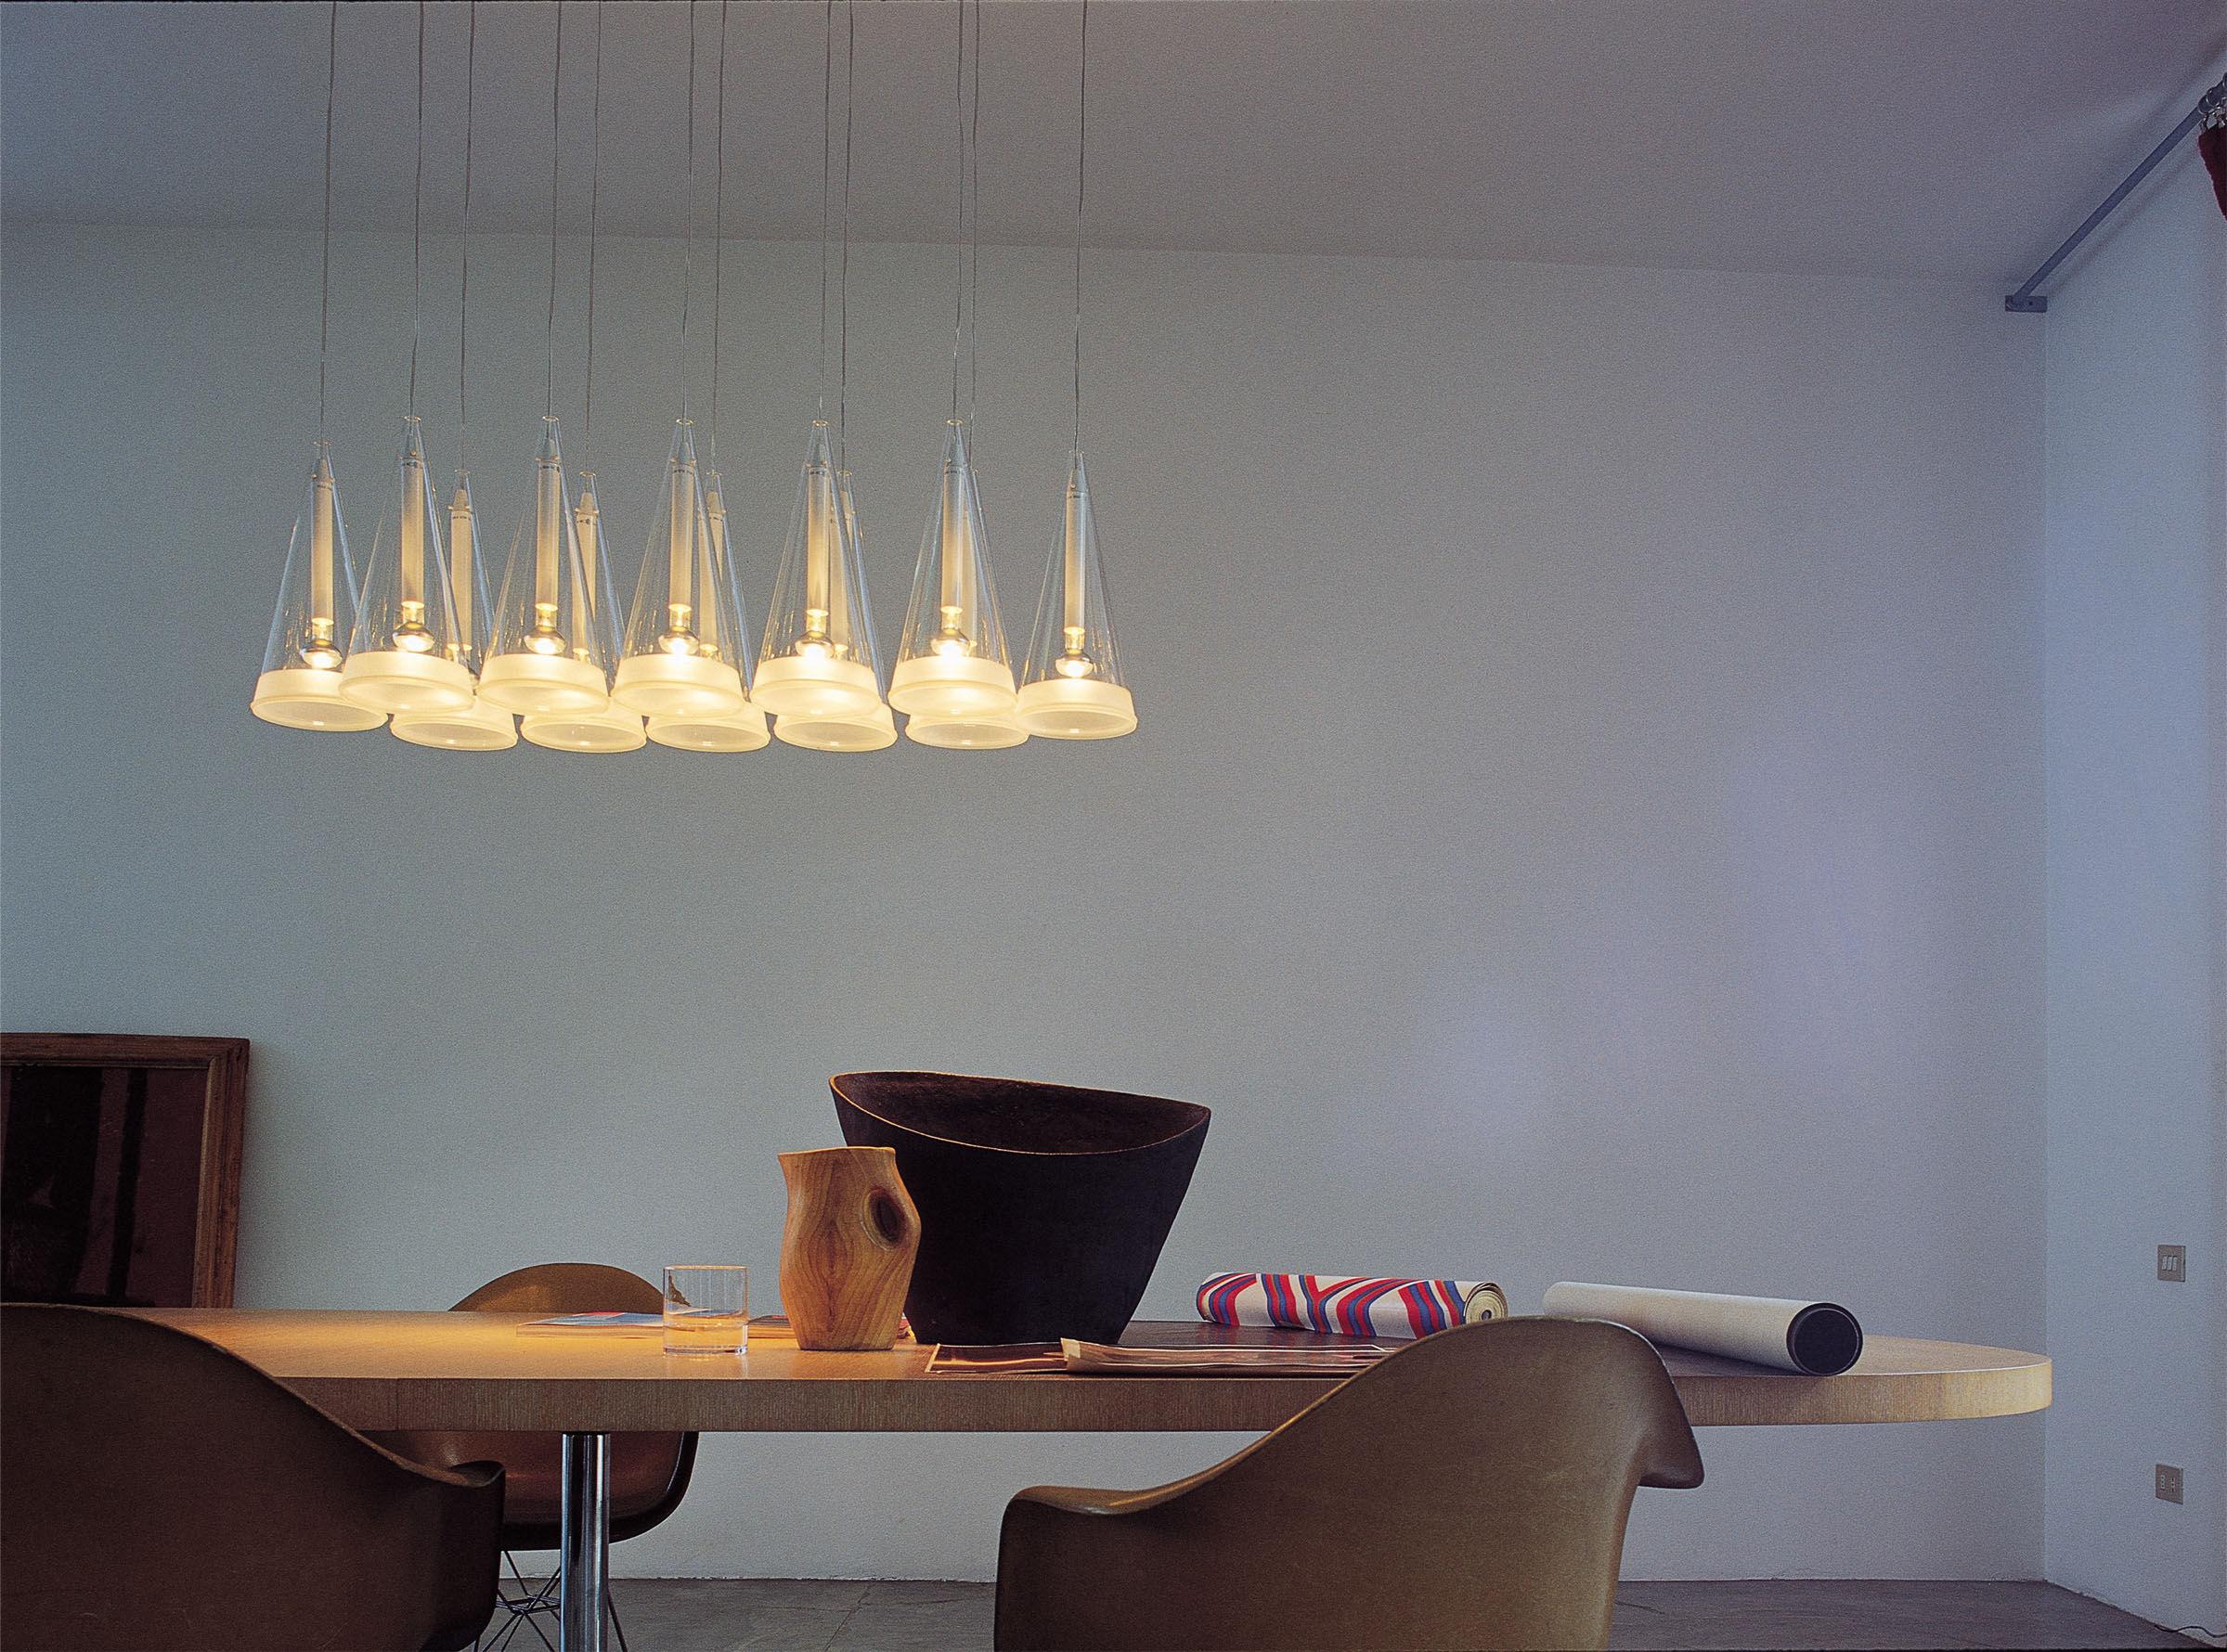 lampadari flos : Home > Illuminazione > Lampadari > Sospensione Fucsia 1 di Flos